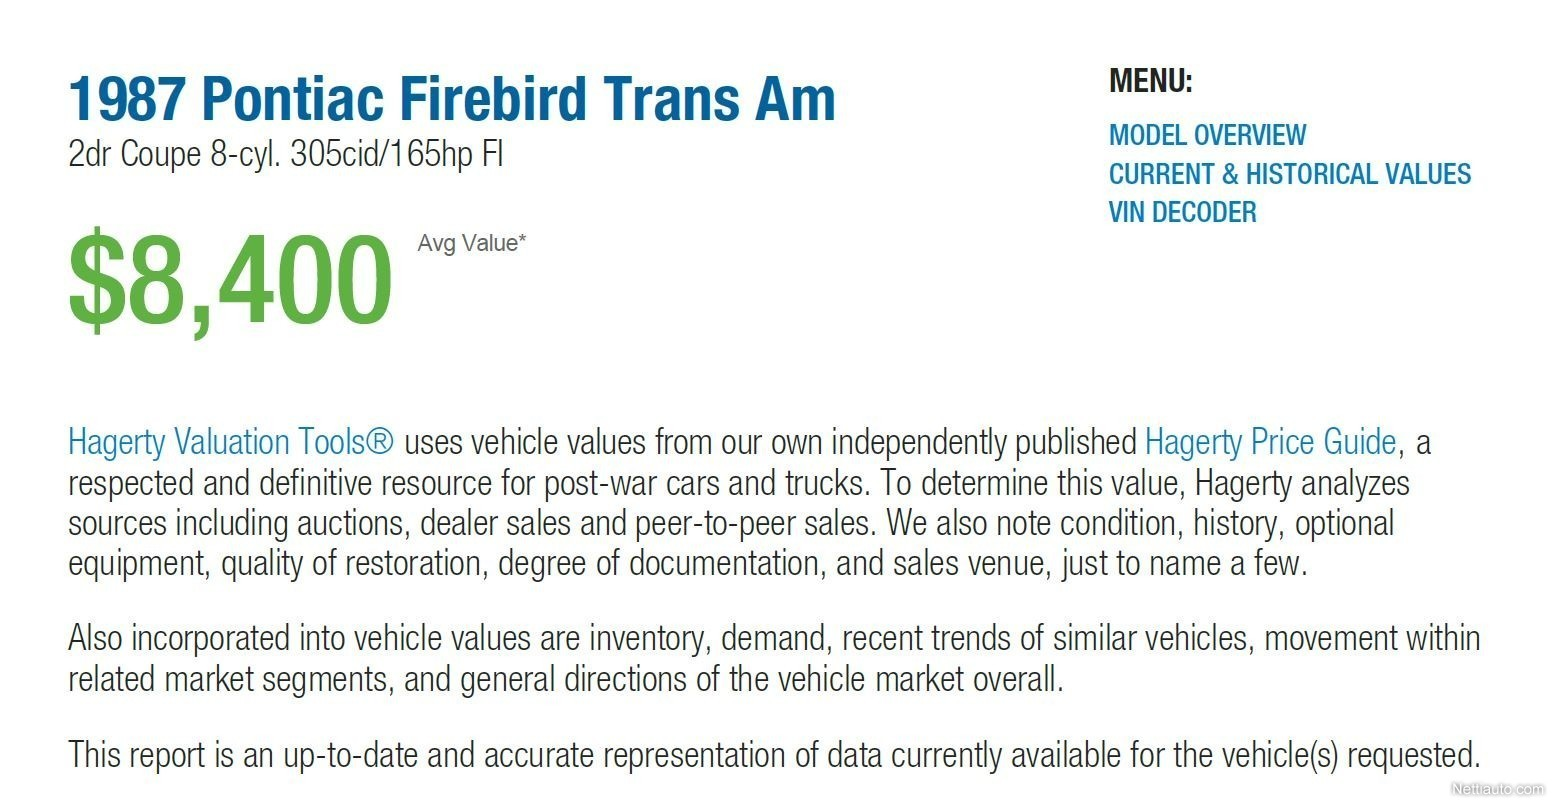 Hagerty Valuation Tool >> Pontiac Firebird Trans Am